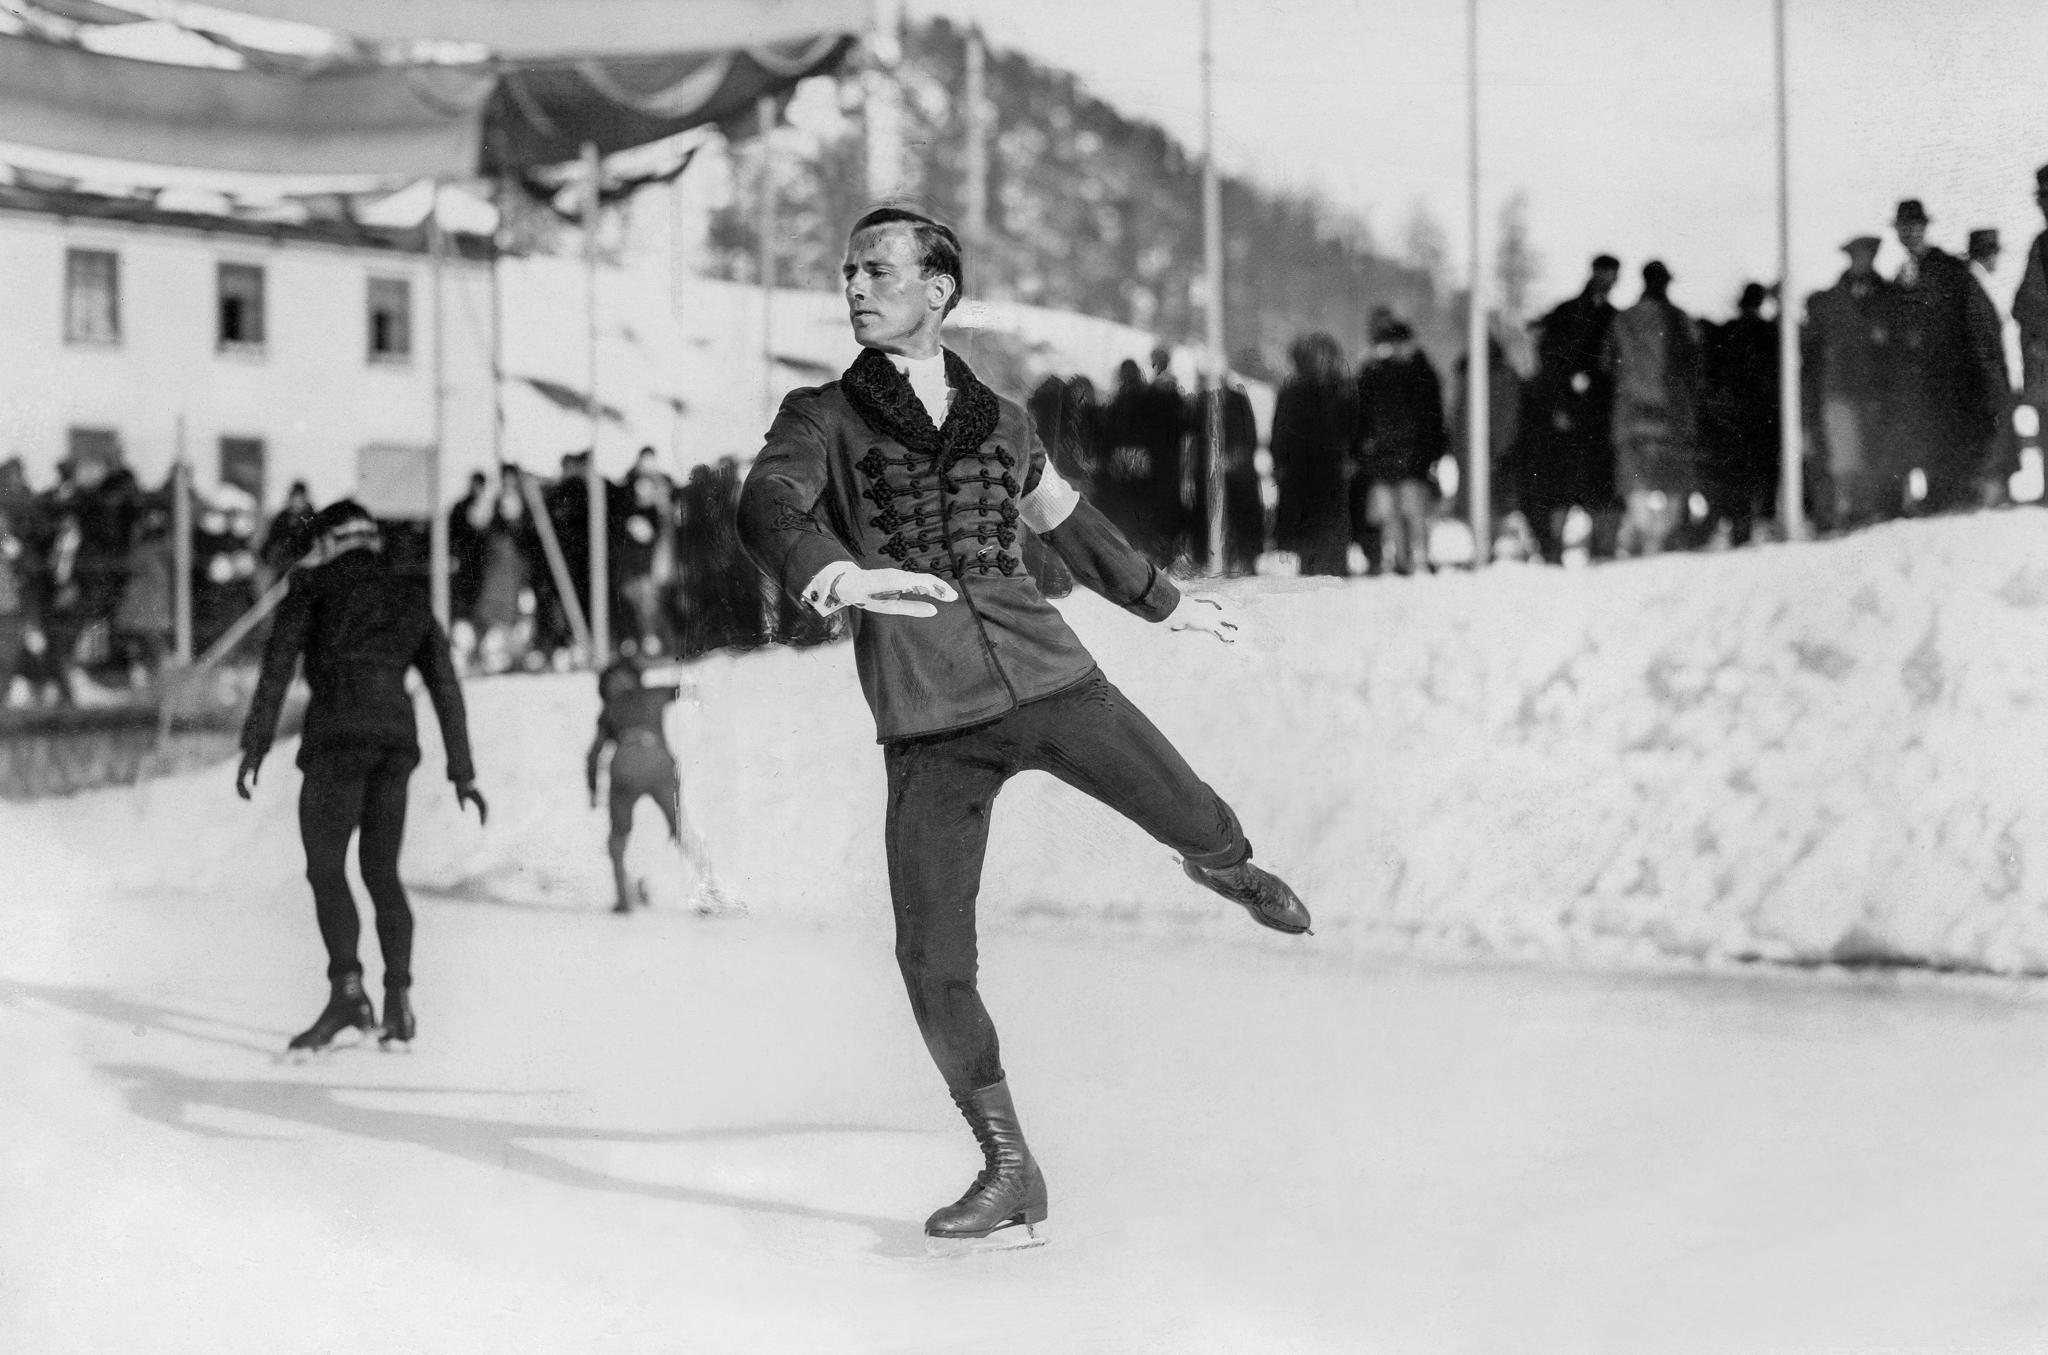 Patinador de gelo em 1928 (© Gerhard Riebicke/ullstein bild/Getty Images)